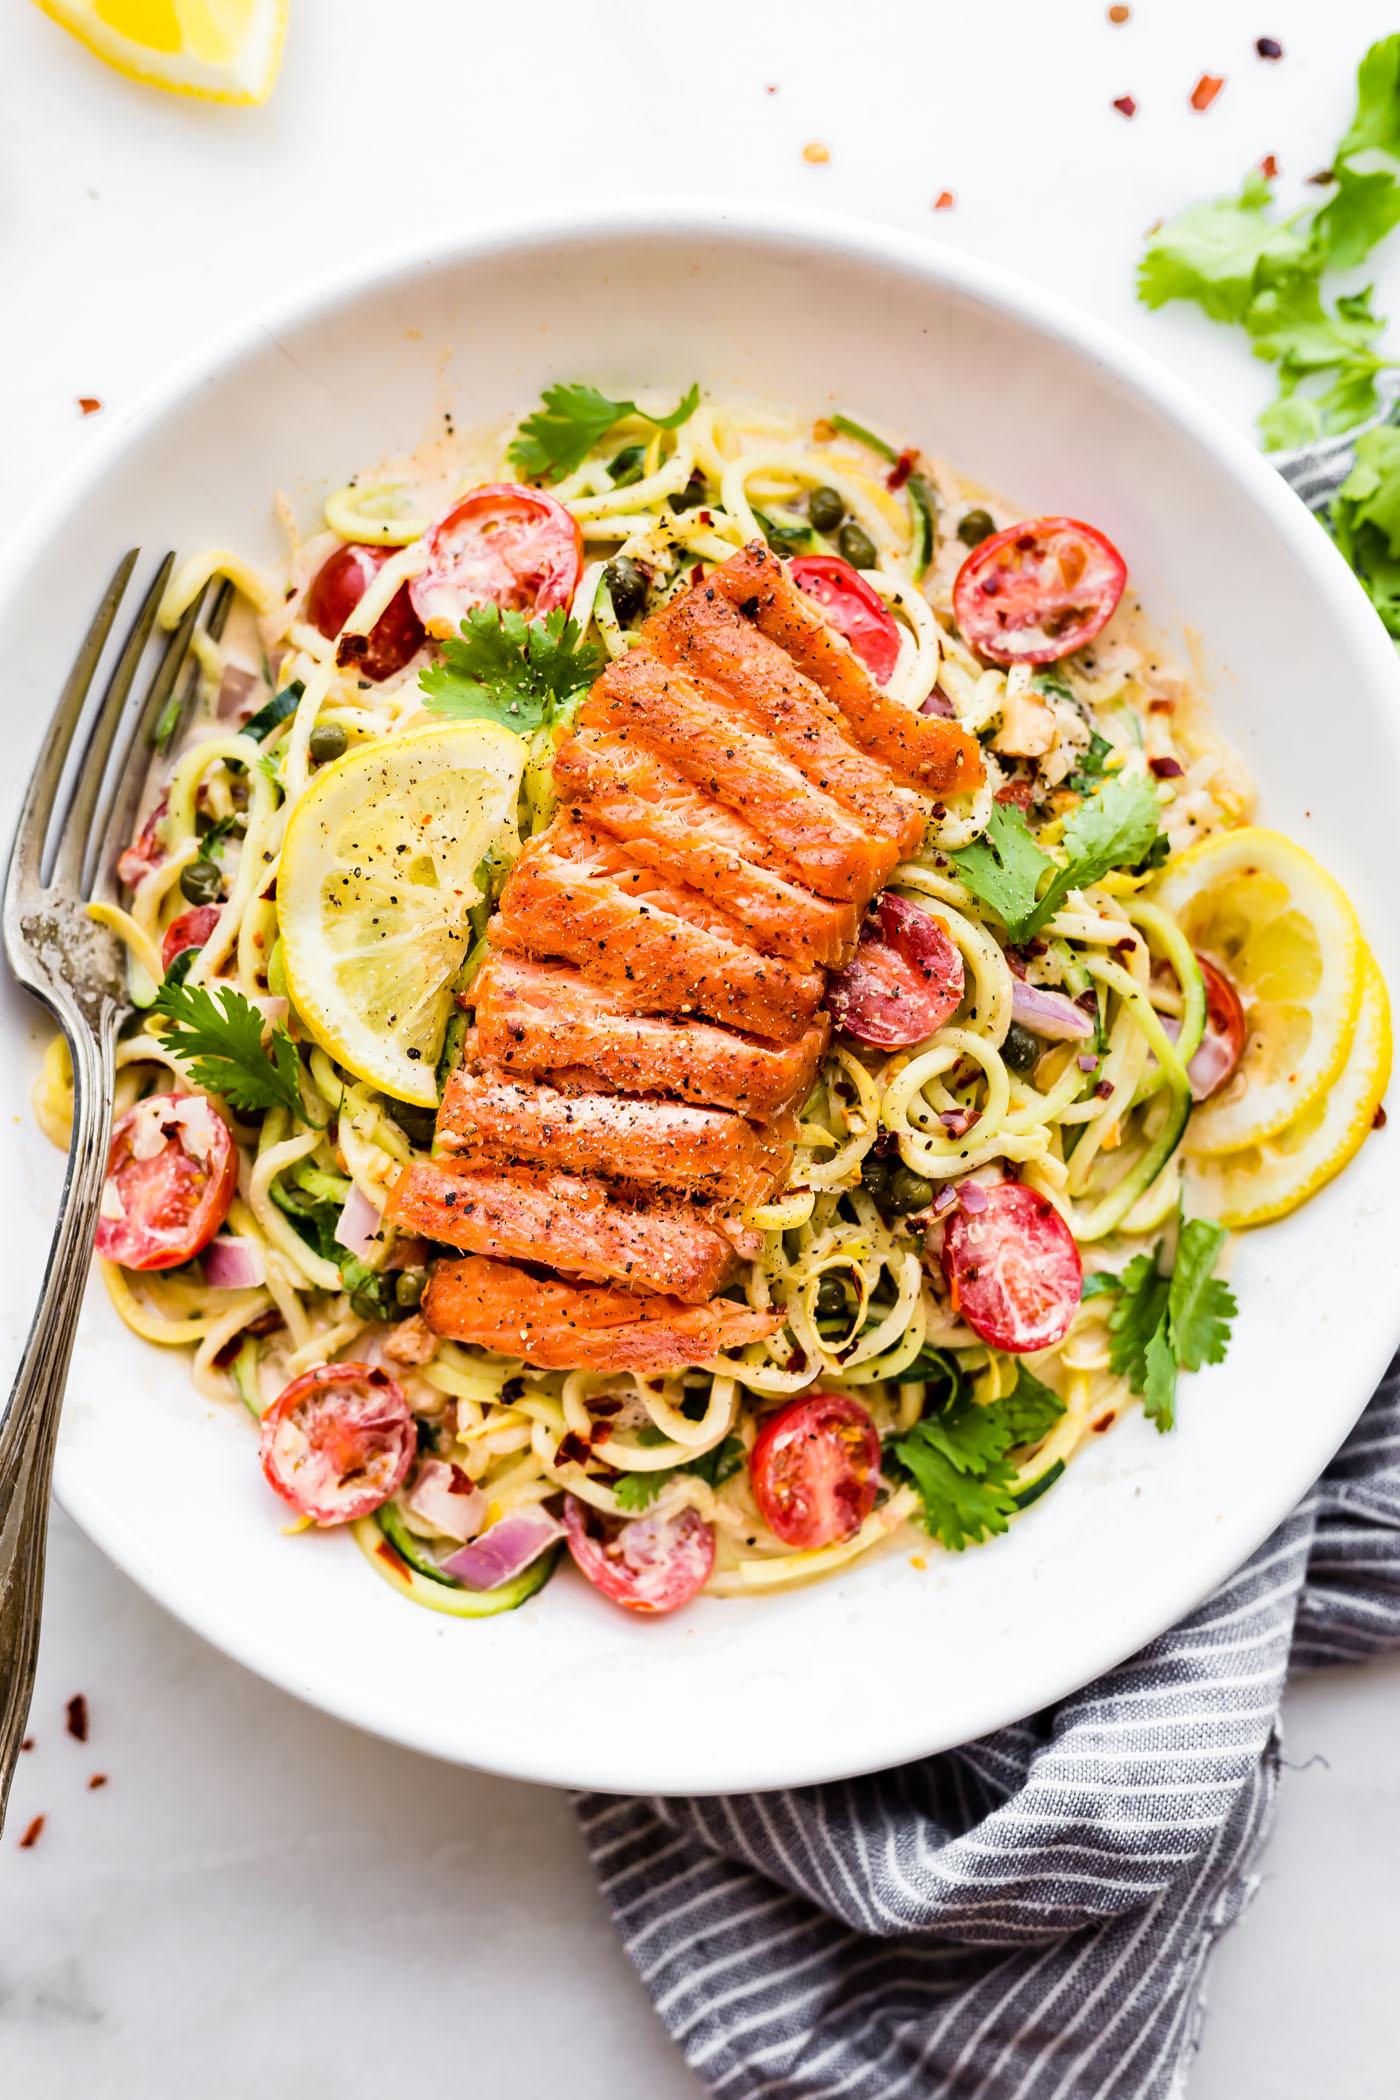 Cajun Smoked Salmon Zucchini Noodles Salad {Paleo, low carb friendly}